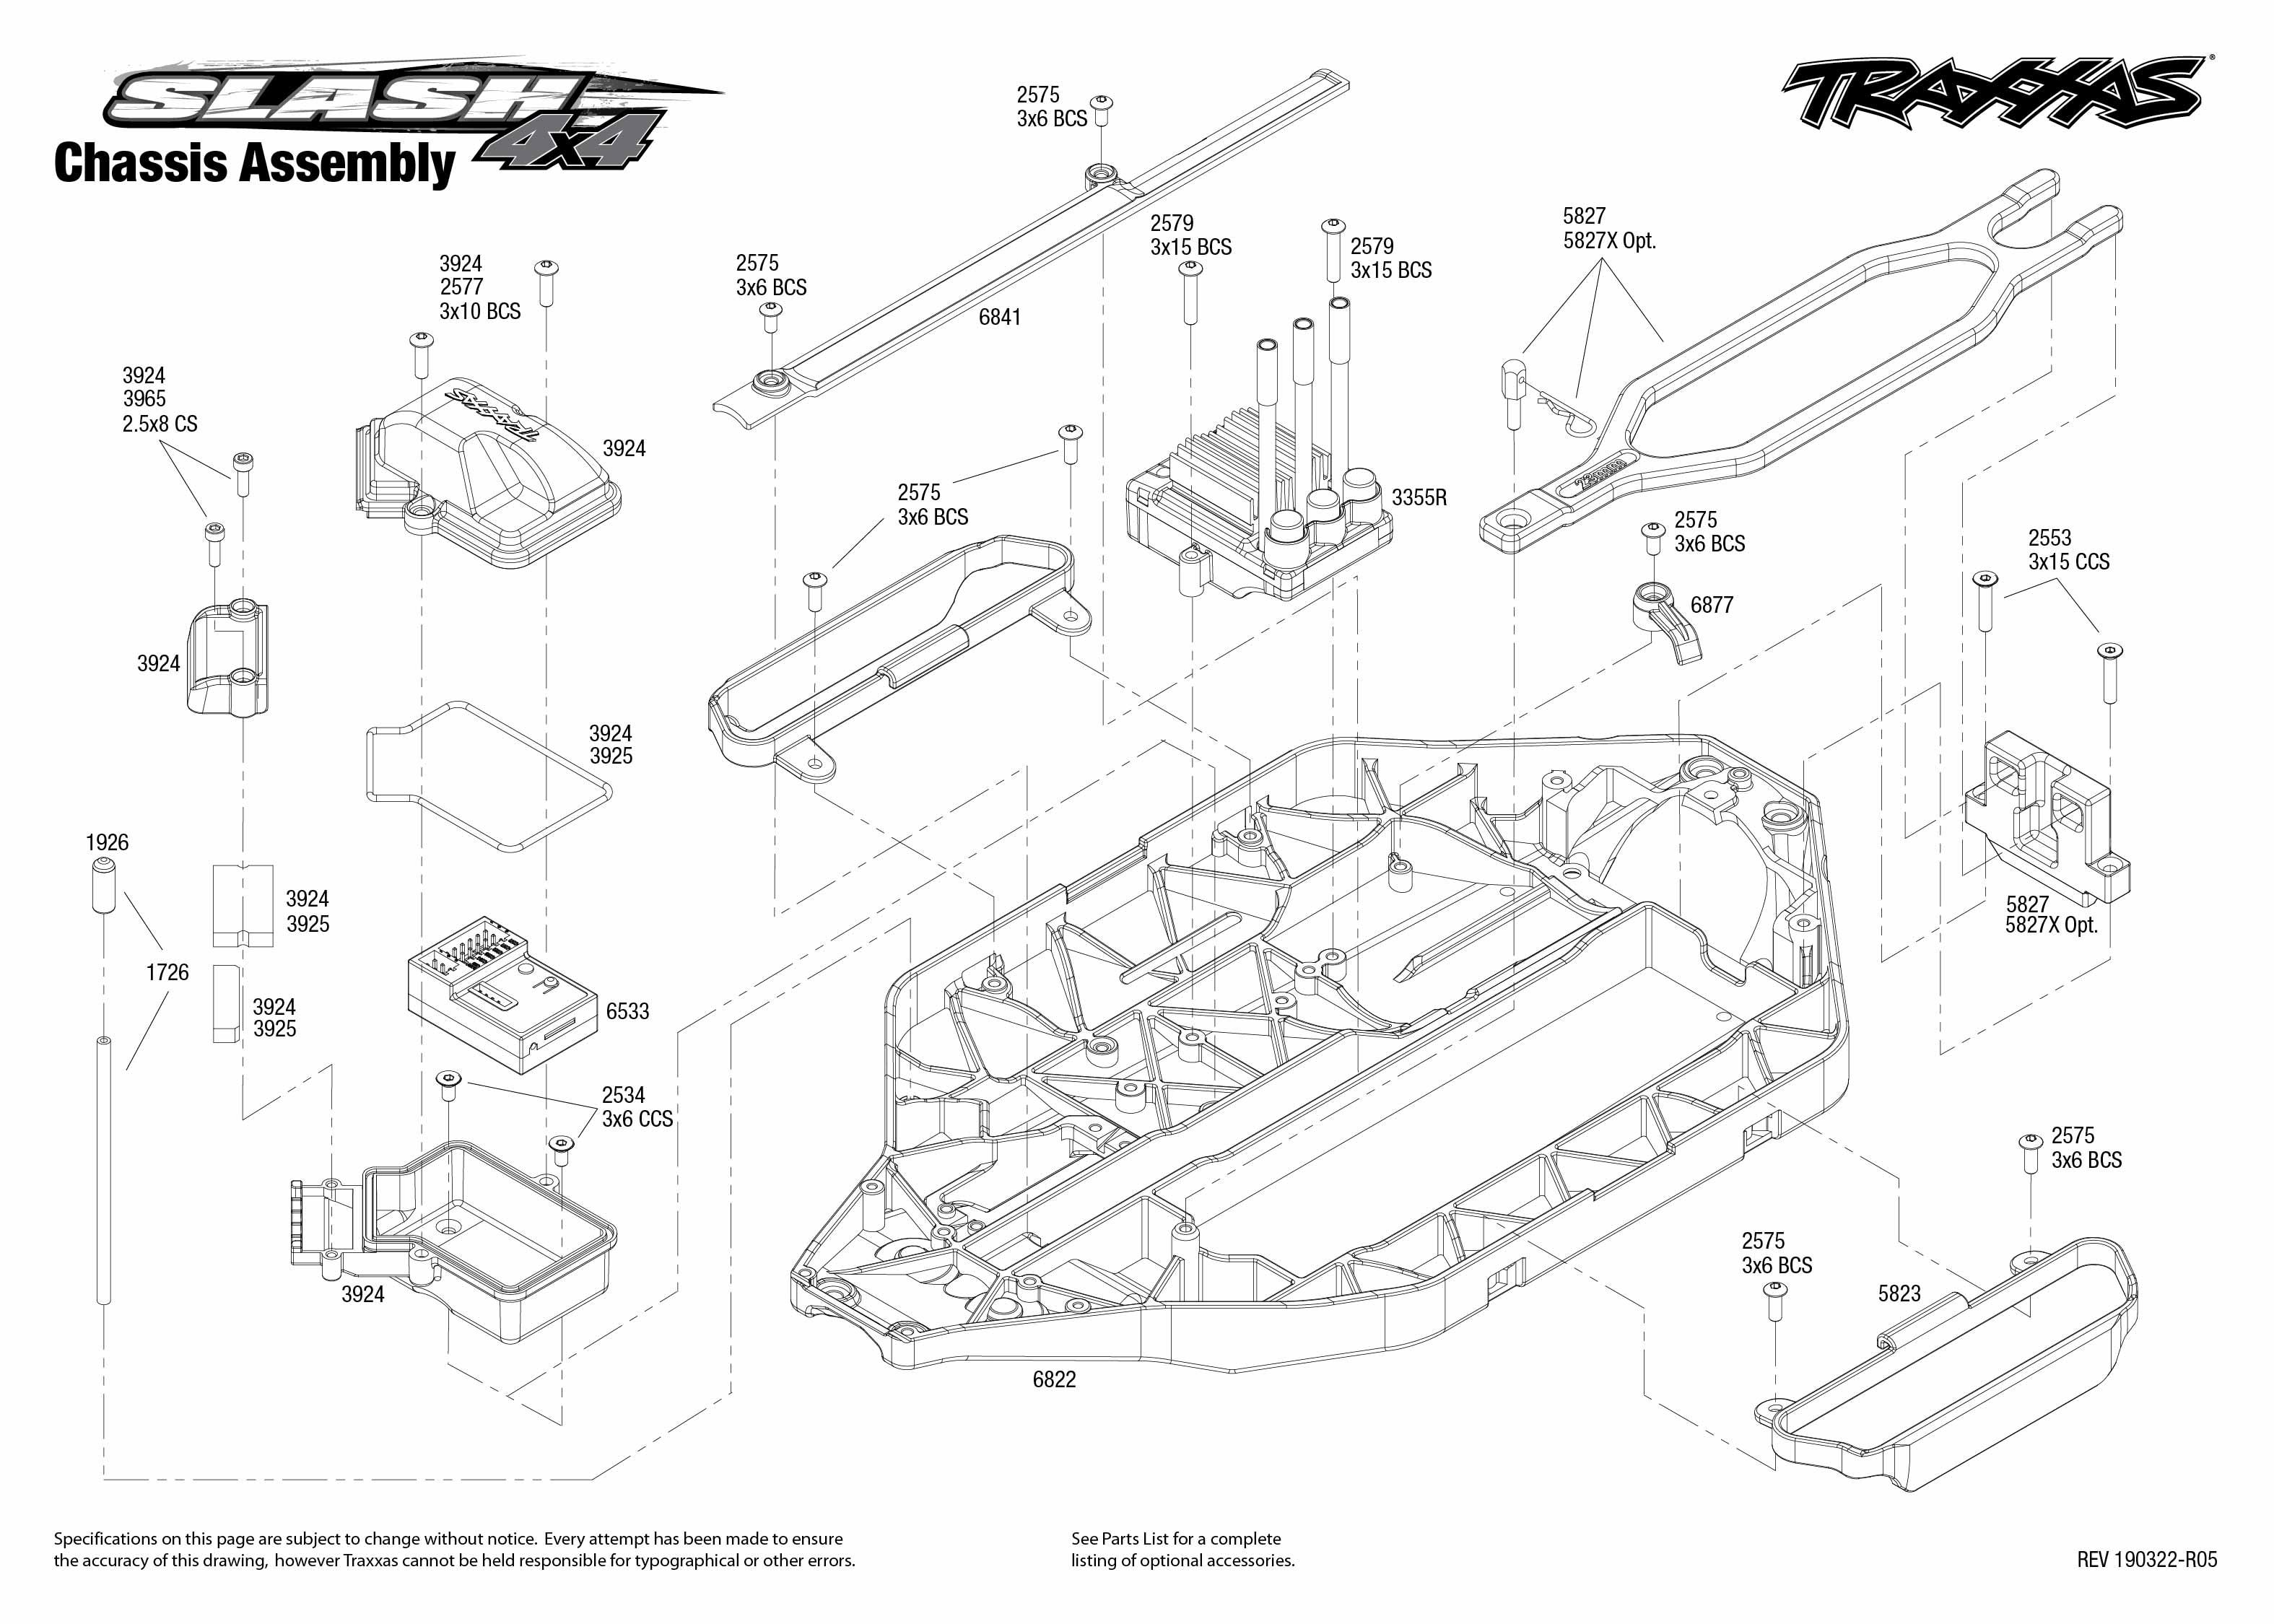 Traxxas Slash 4X4 VXL 1/10 4WD Brushless SCT, Vision